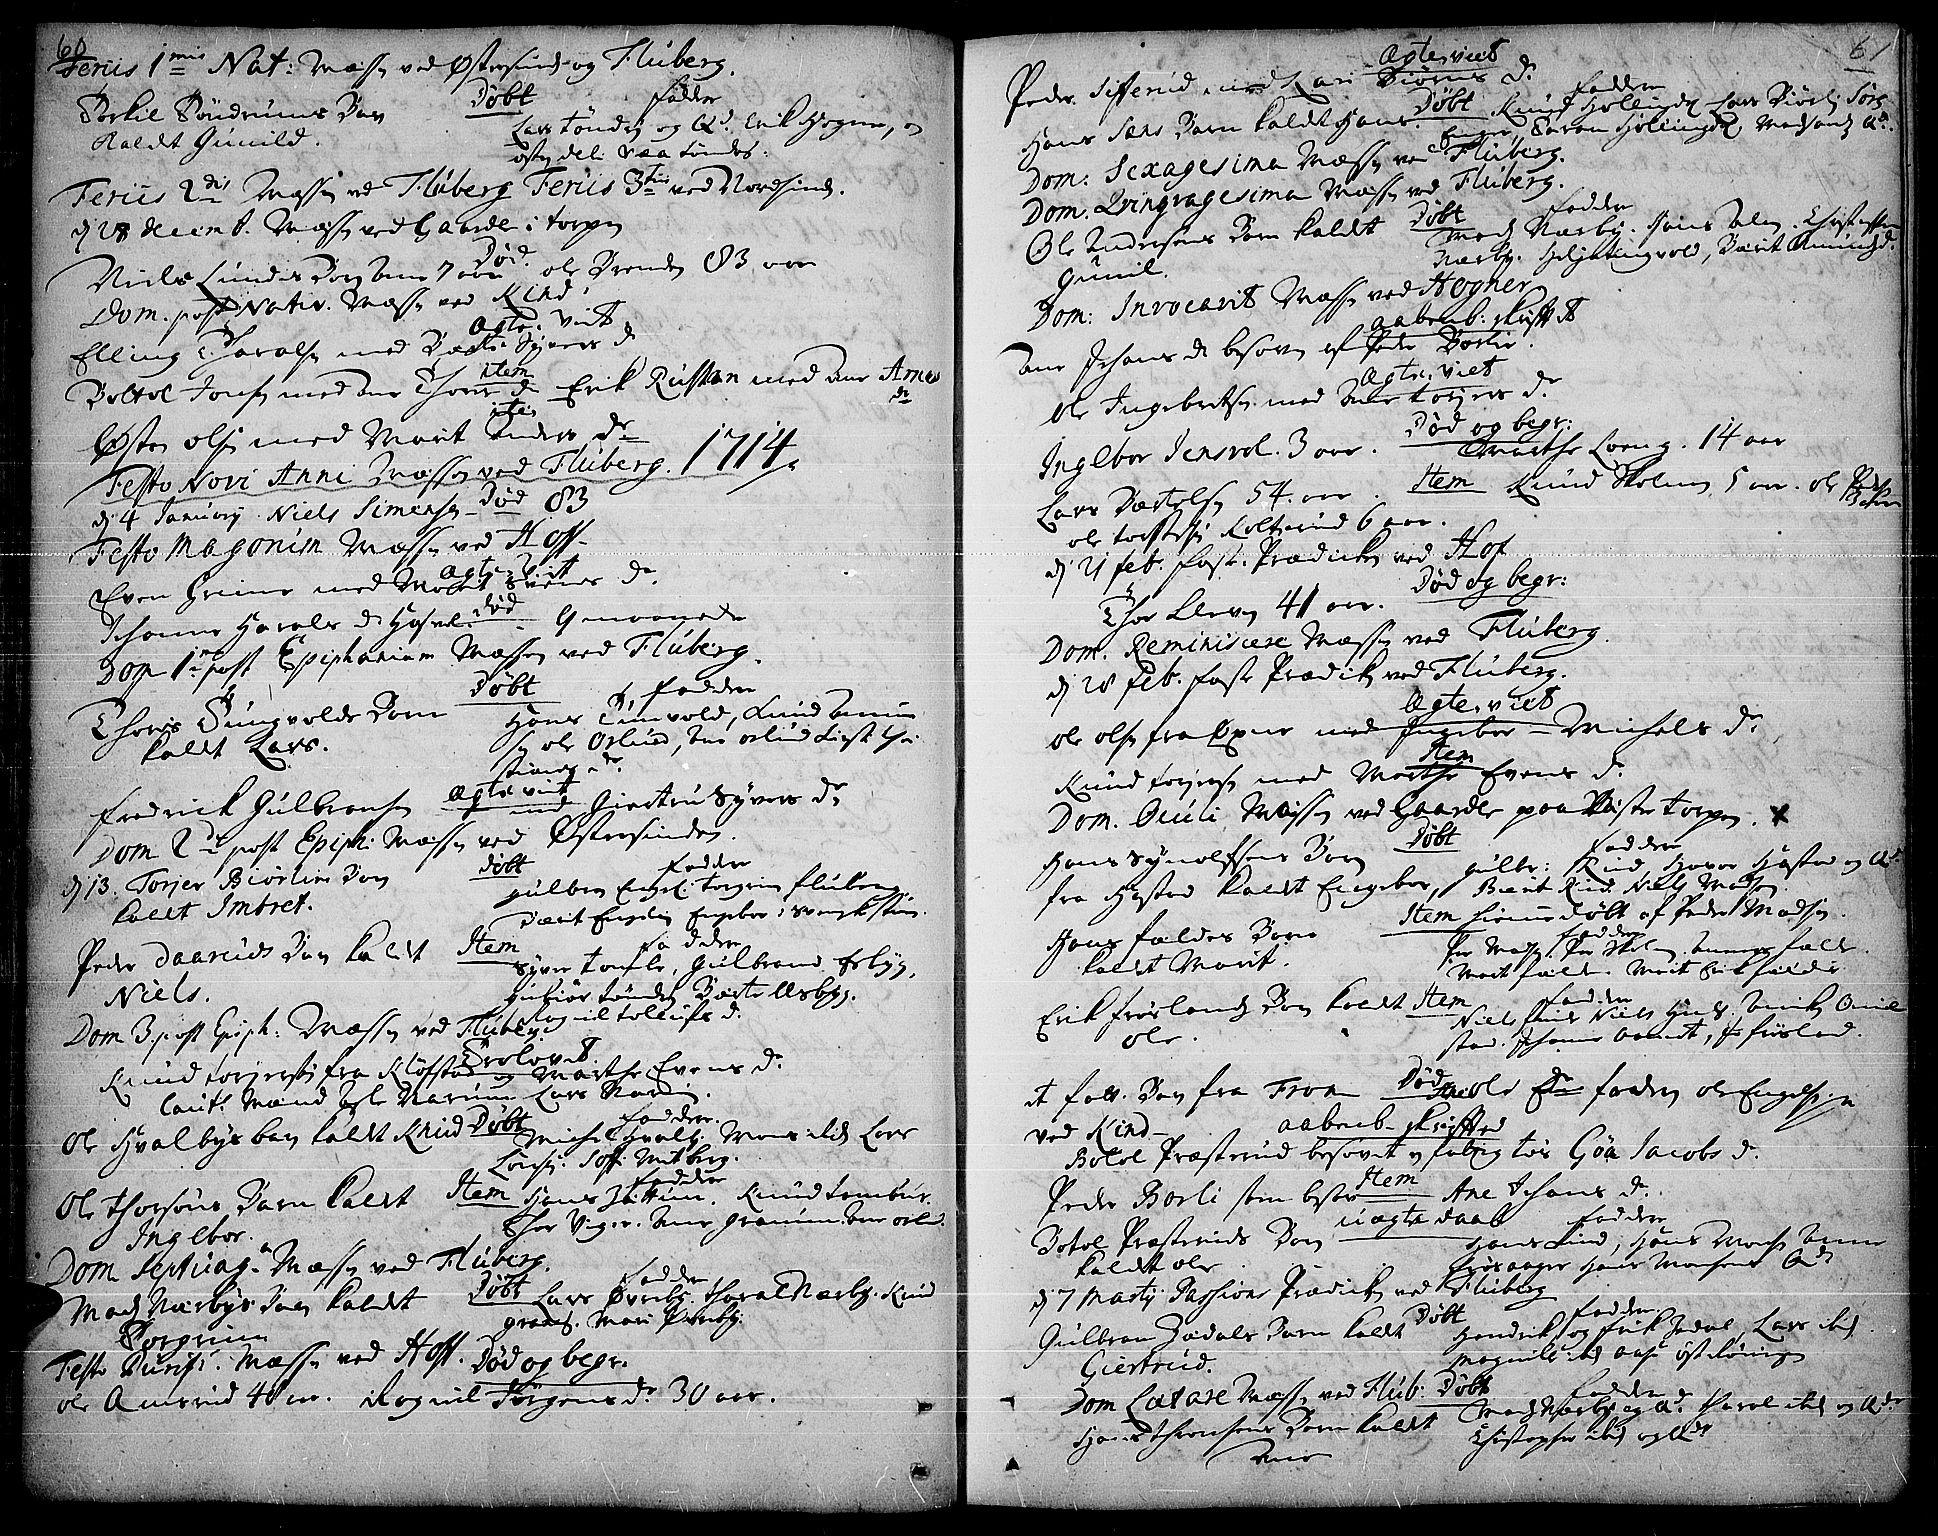 SAH, Land prestekontor, Ministerialbok nr. 1, 1708-1732, s. 60-61